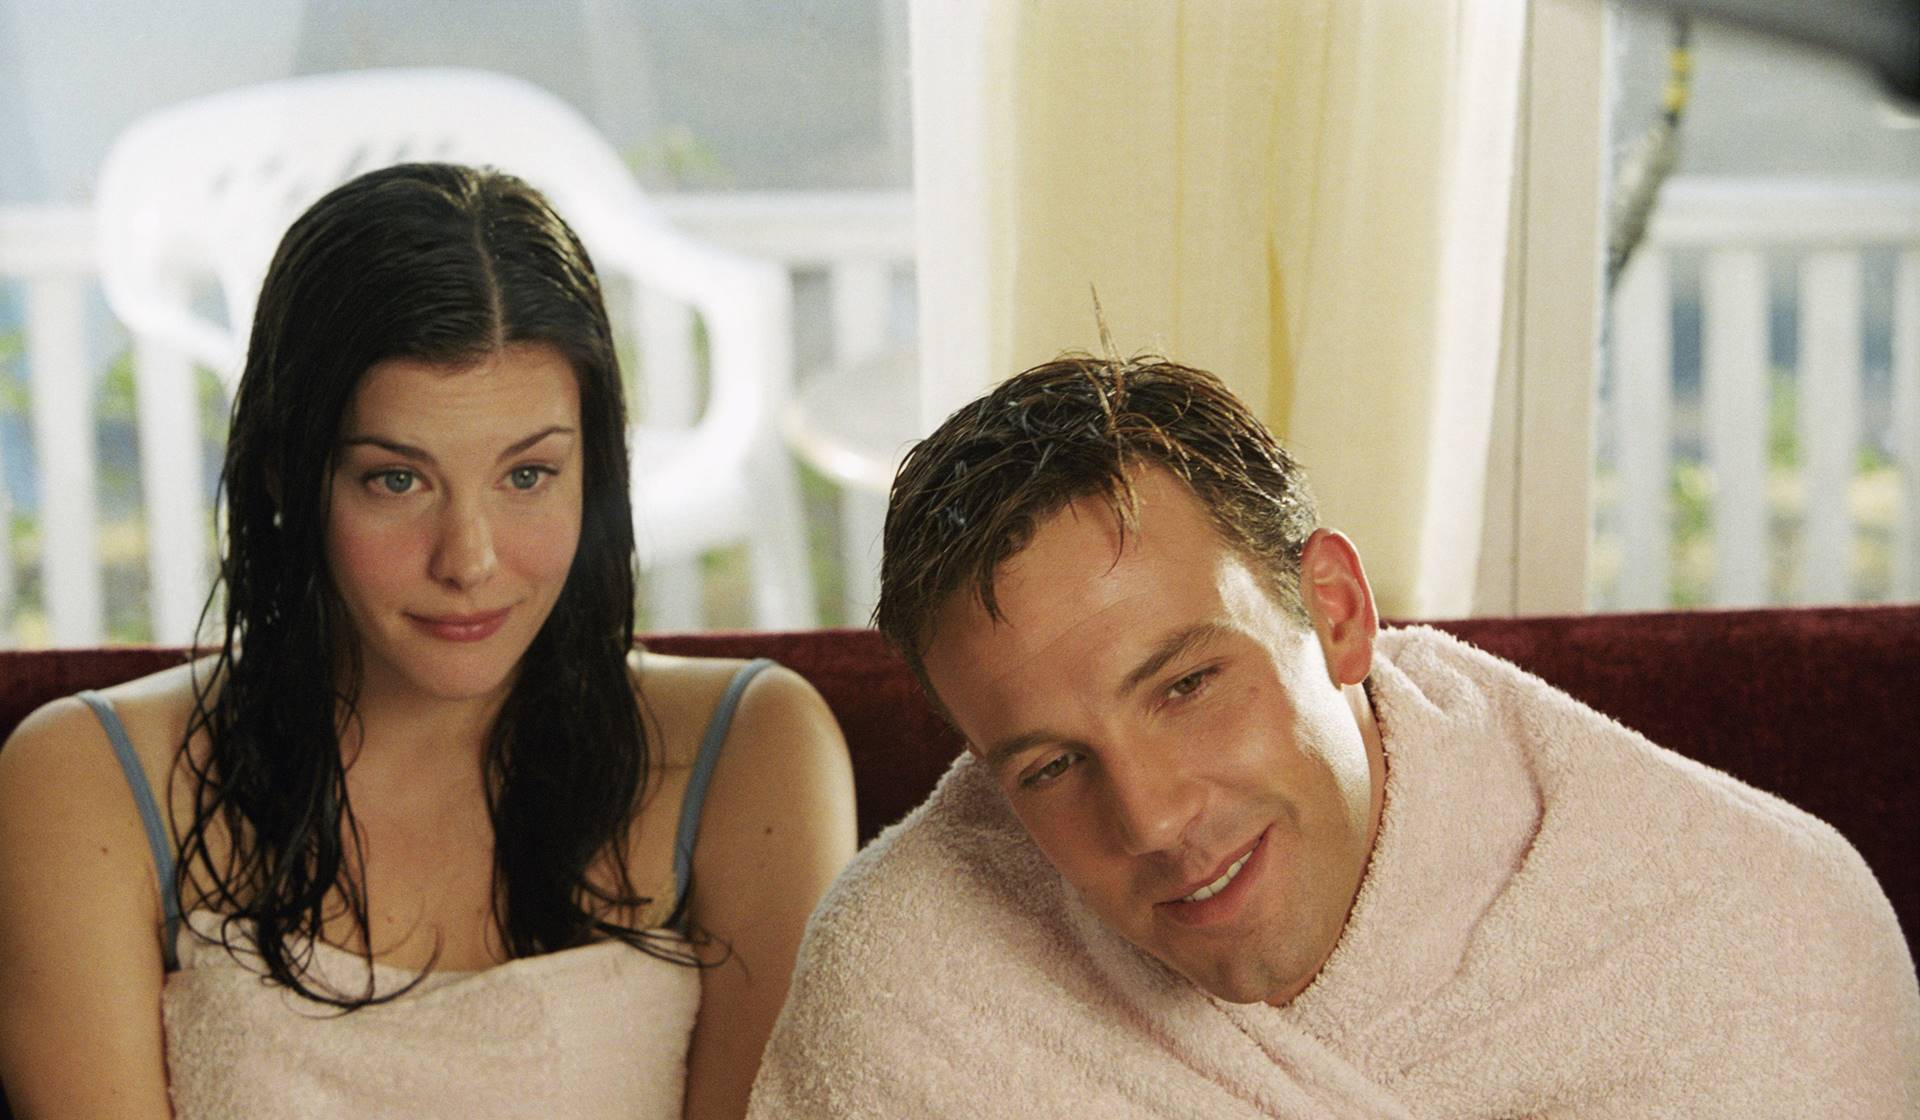 'Jersey Girl' de Kevin Smith, con Ben Affleck, Jennifer López y Liv Tyler